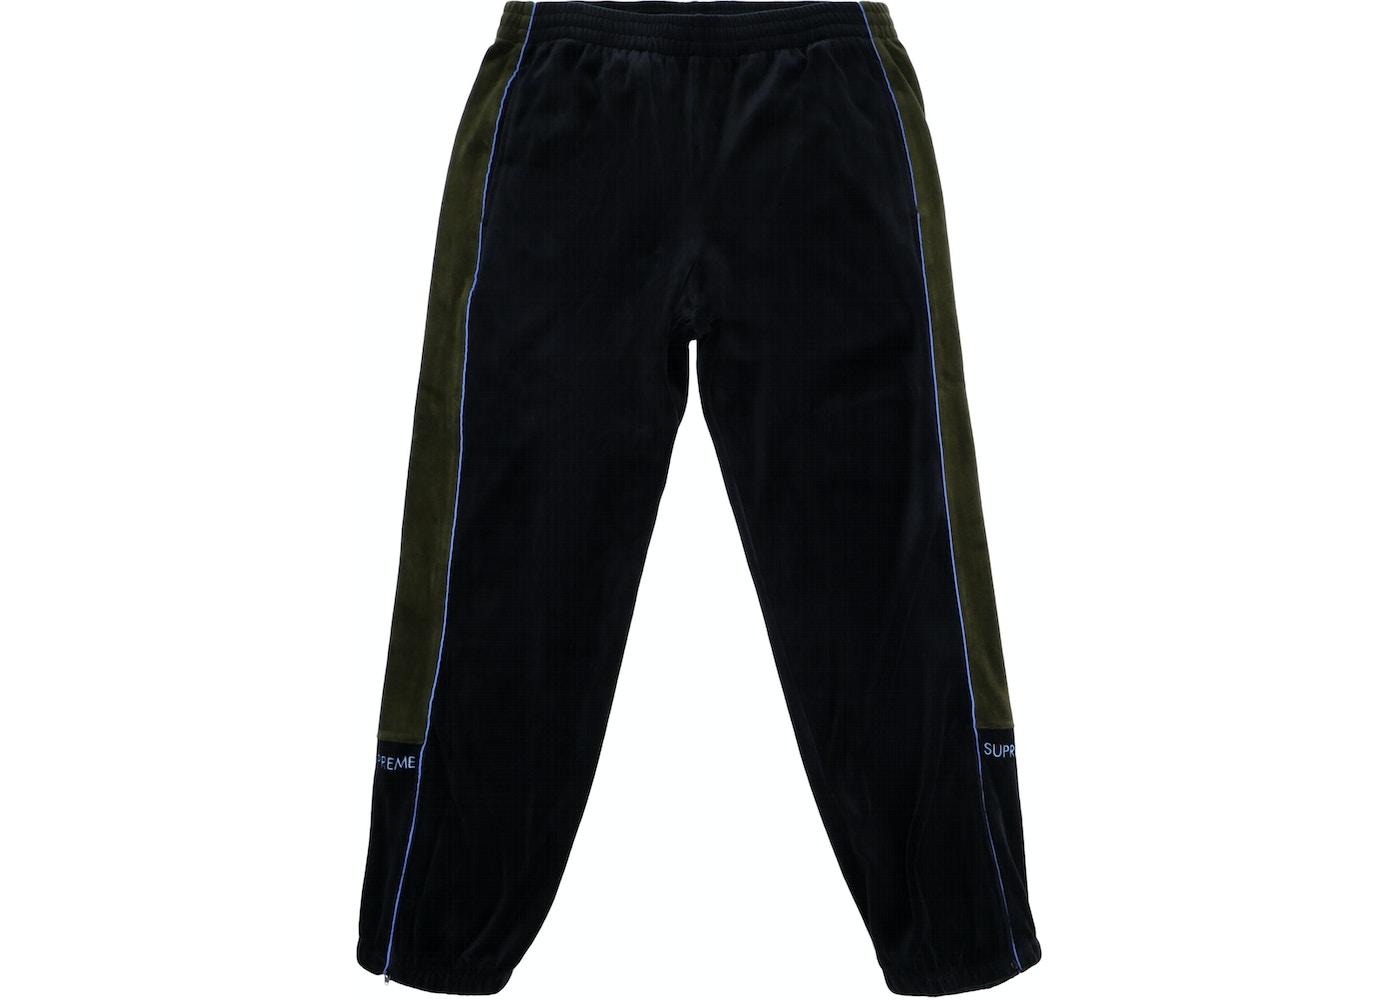 91725dd3743e Supreme Velour Track Pant Black - FW18